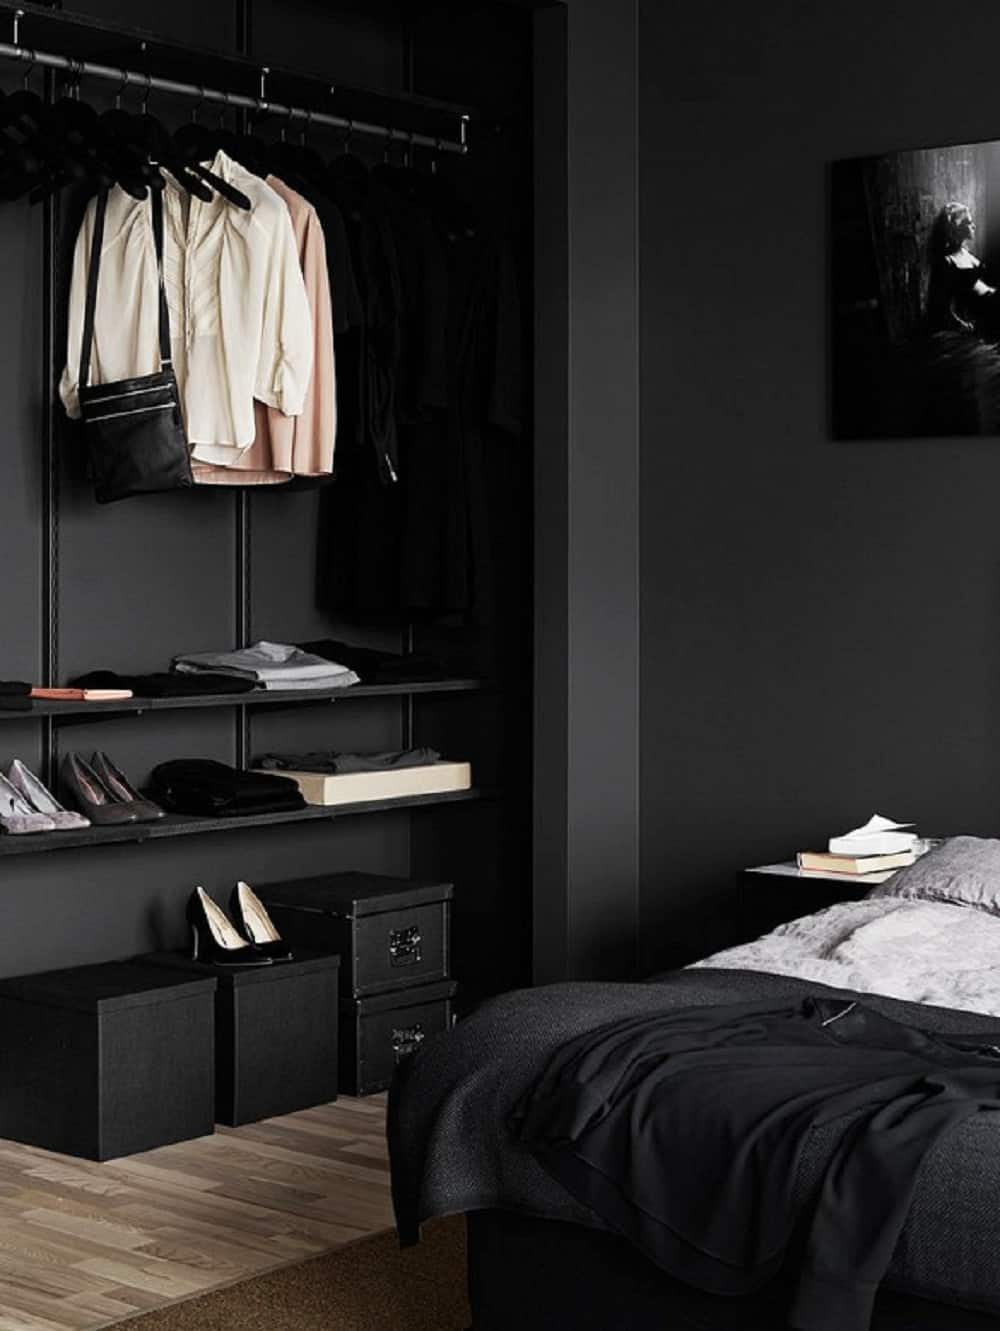 Bedroom clothes storage